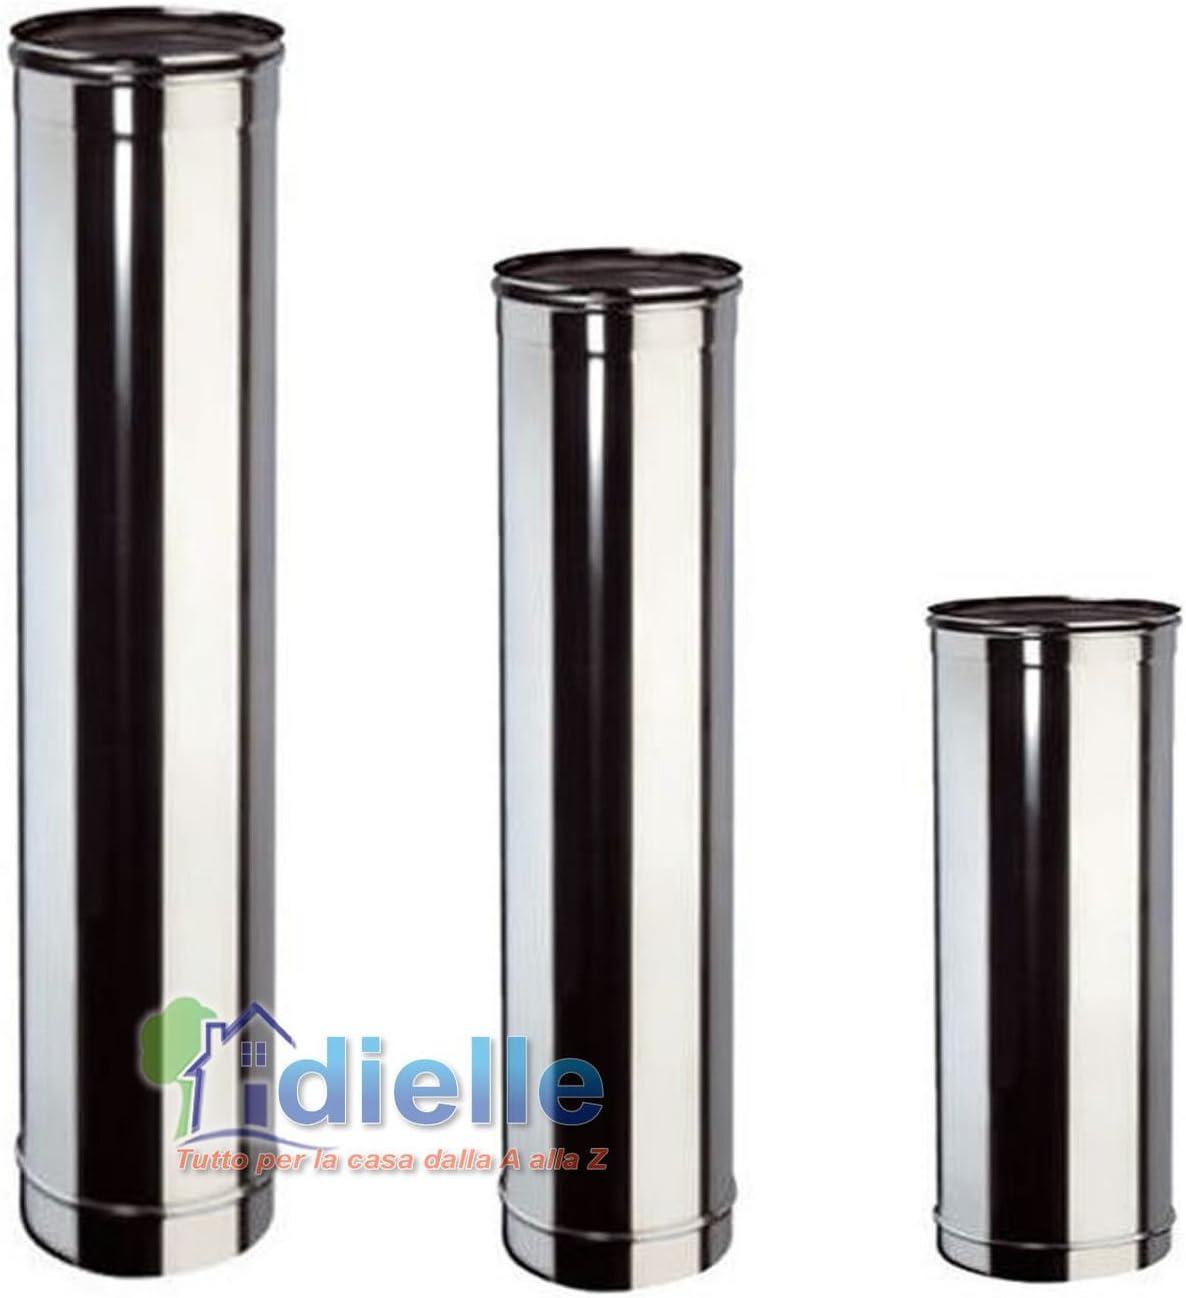 Electronics-Salon lento Colpo Tubo di vetro fusibile assortimento Kit 250 mA ~ 6.3 a. 5 x 20 mm